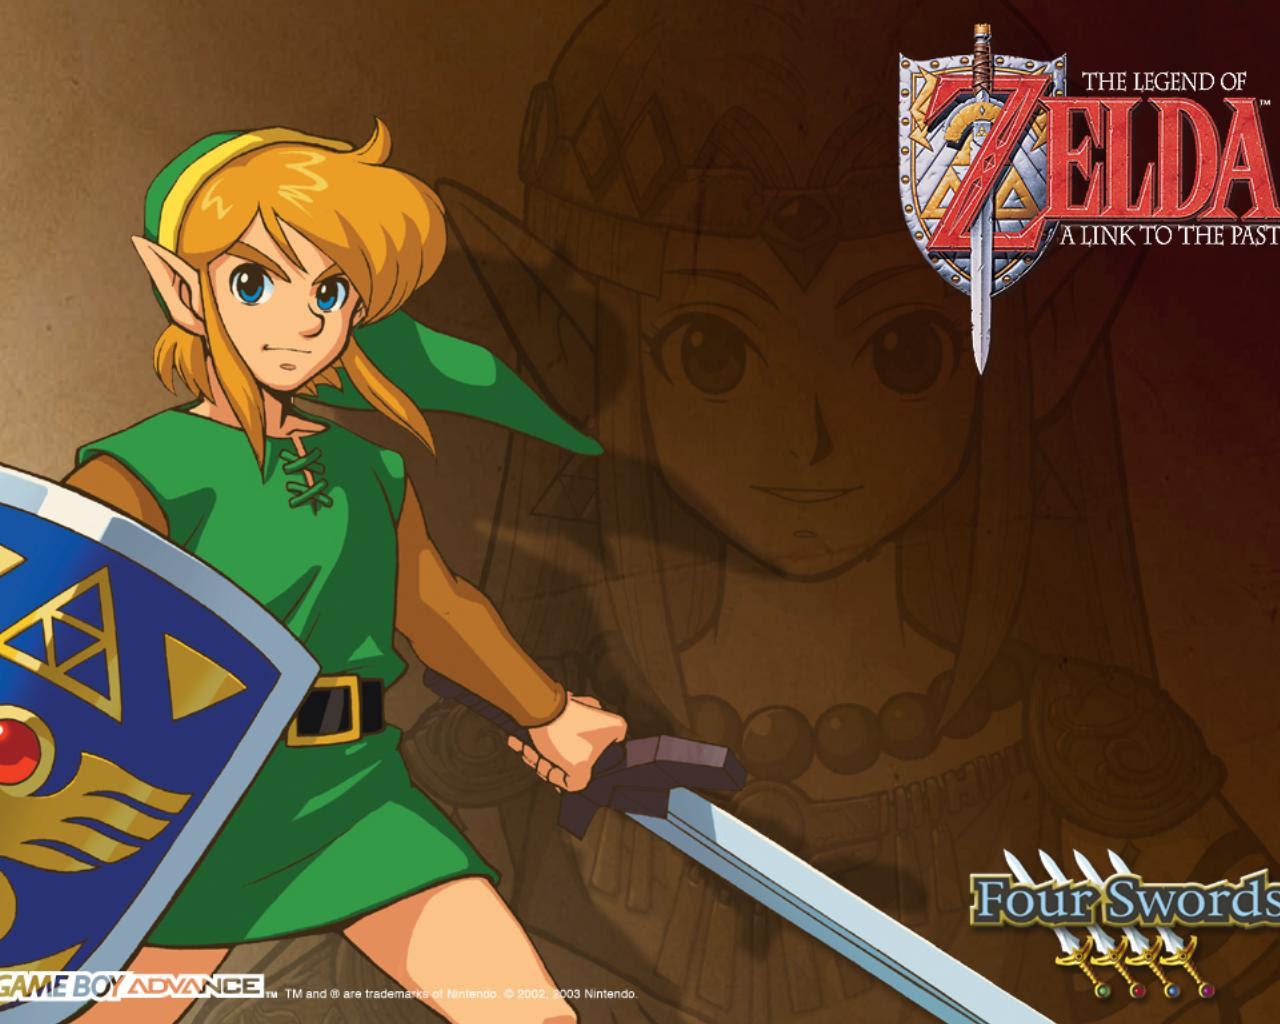 A Link To The Past The Legend Of Zelda Wallpaper 39031673 Fanpop